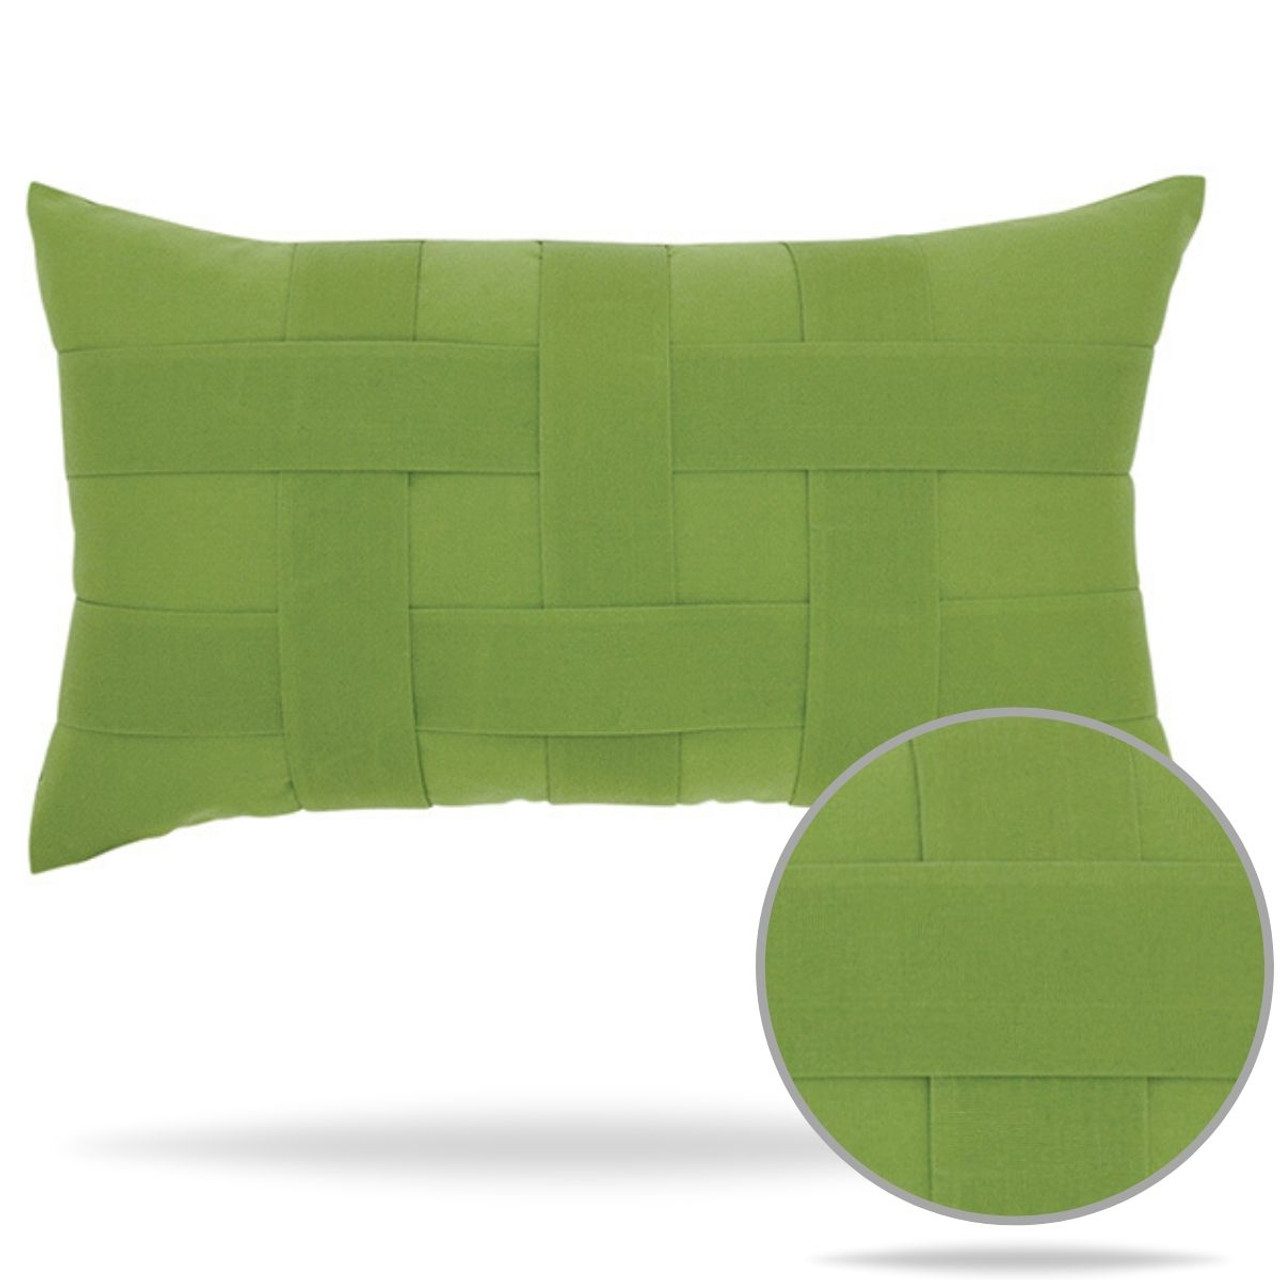 Ginko Basketweave Lumbar Outdoor Sunbrella Pillow By Elaine Smith